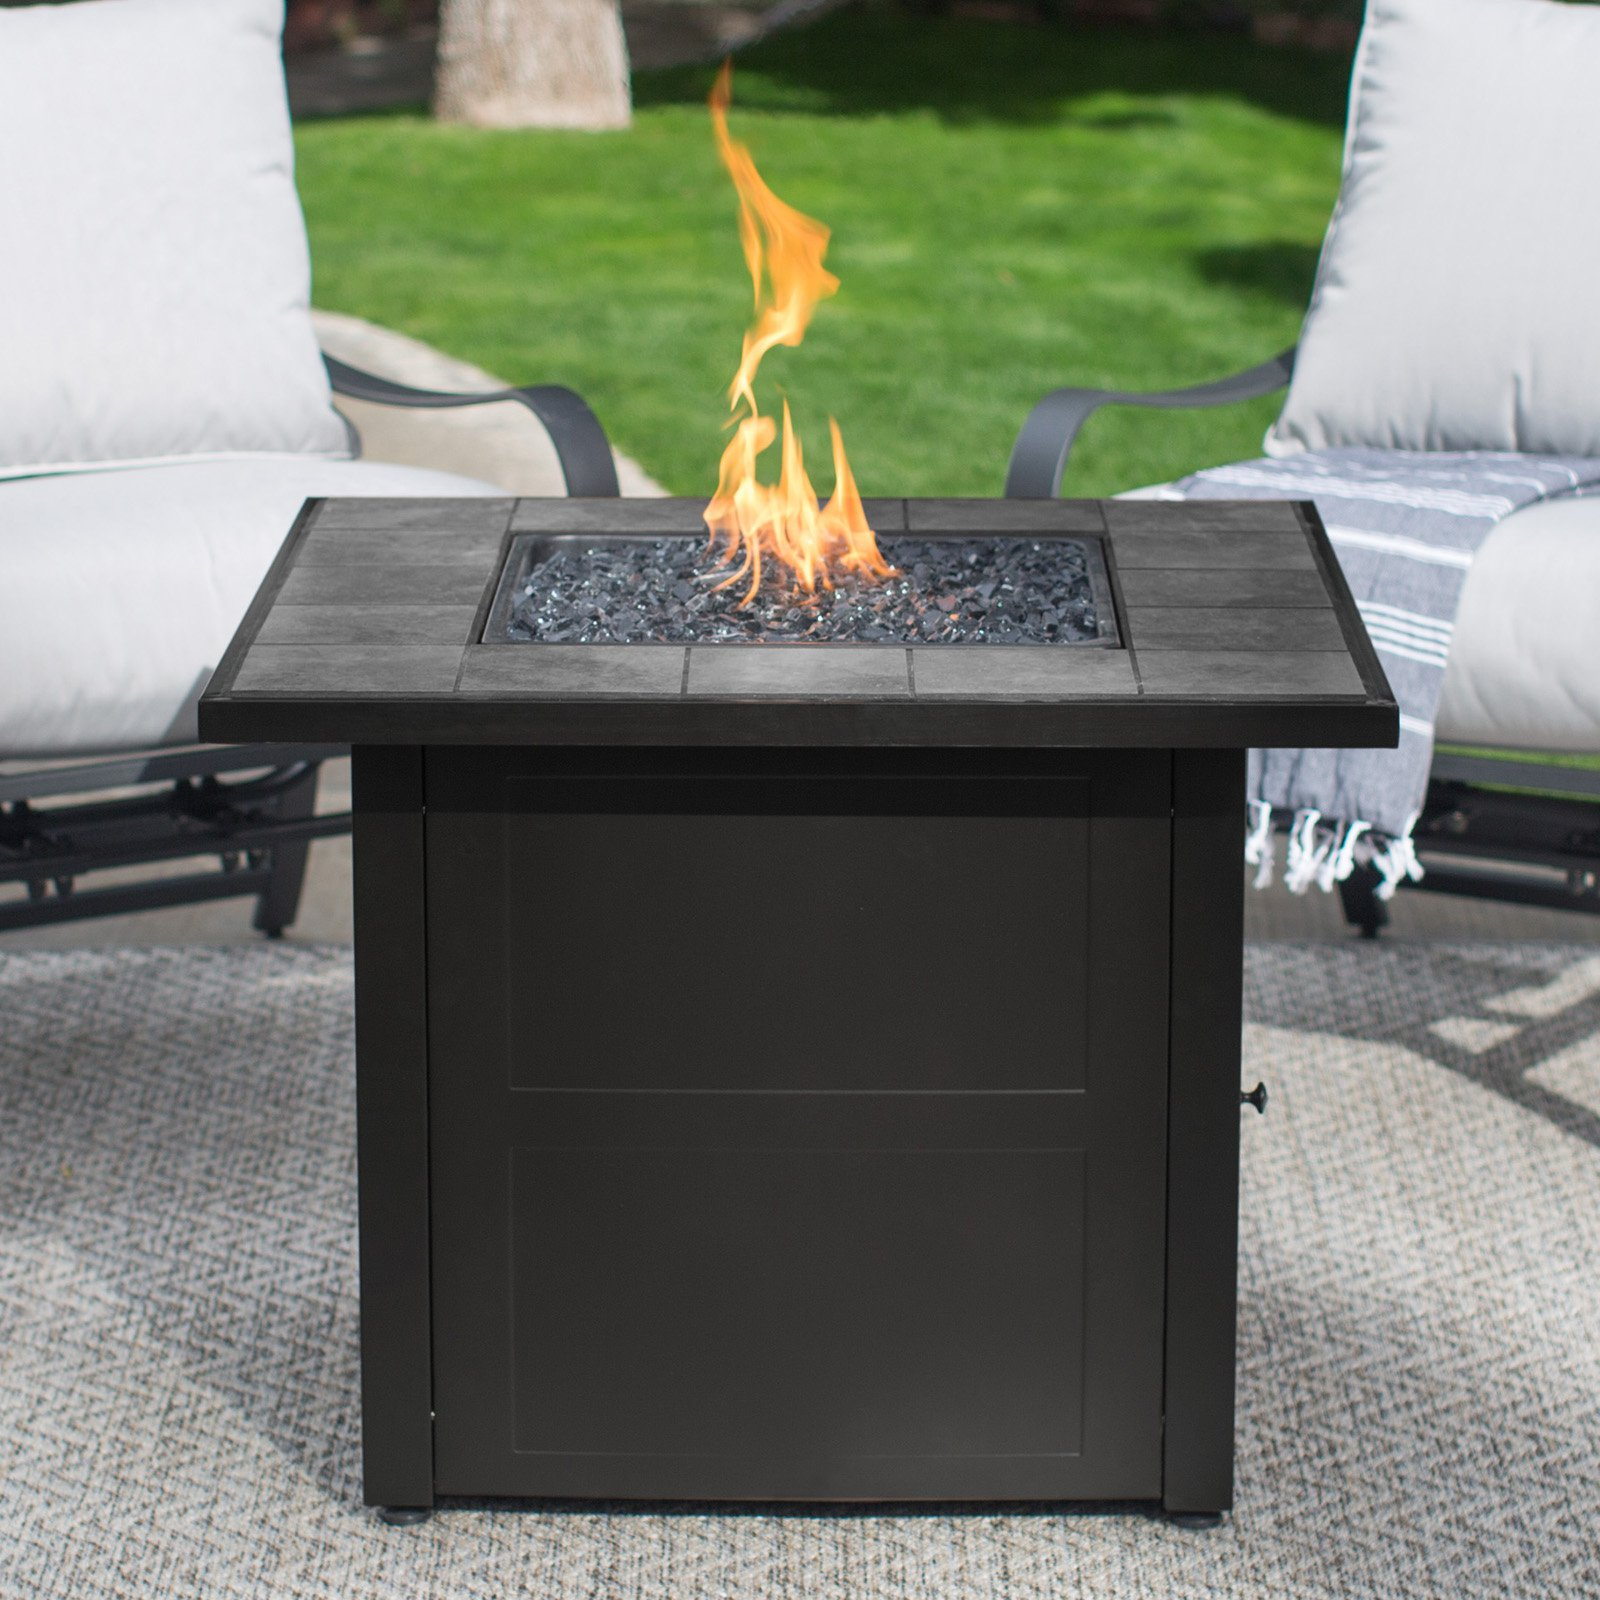 Endless Summer Lp Gas Outdoor Fire Pit Slate Tile Mantel Walmart in measurements 1600 X 1600